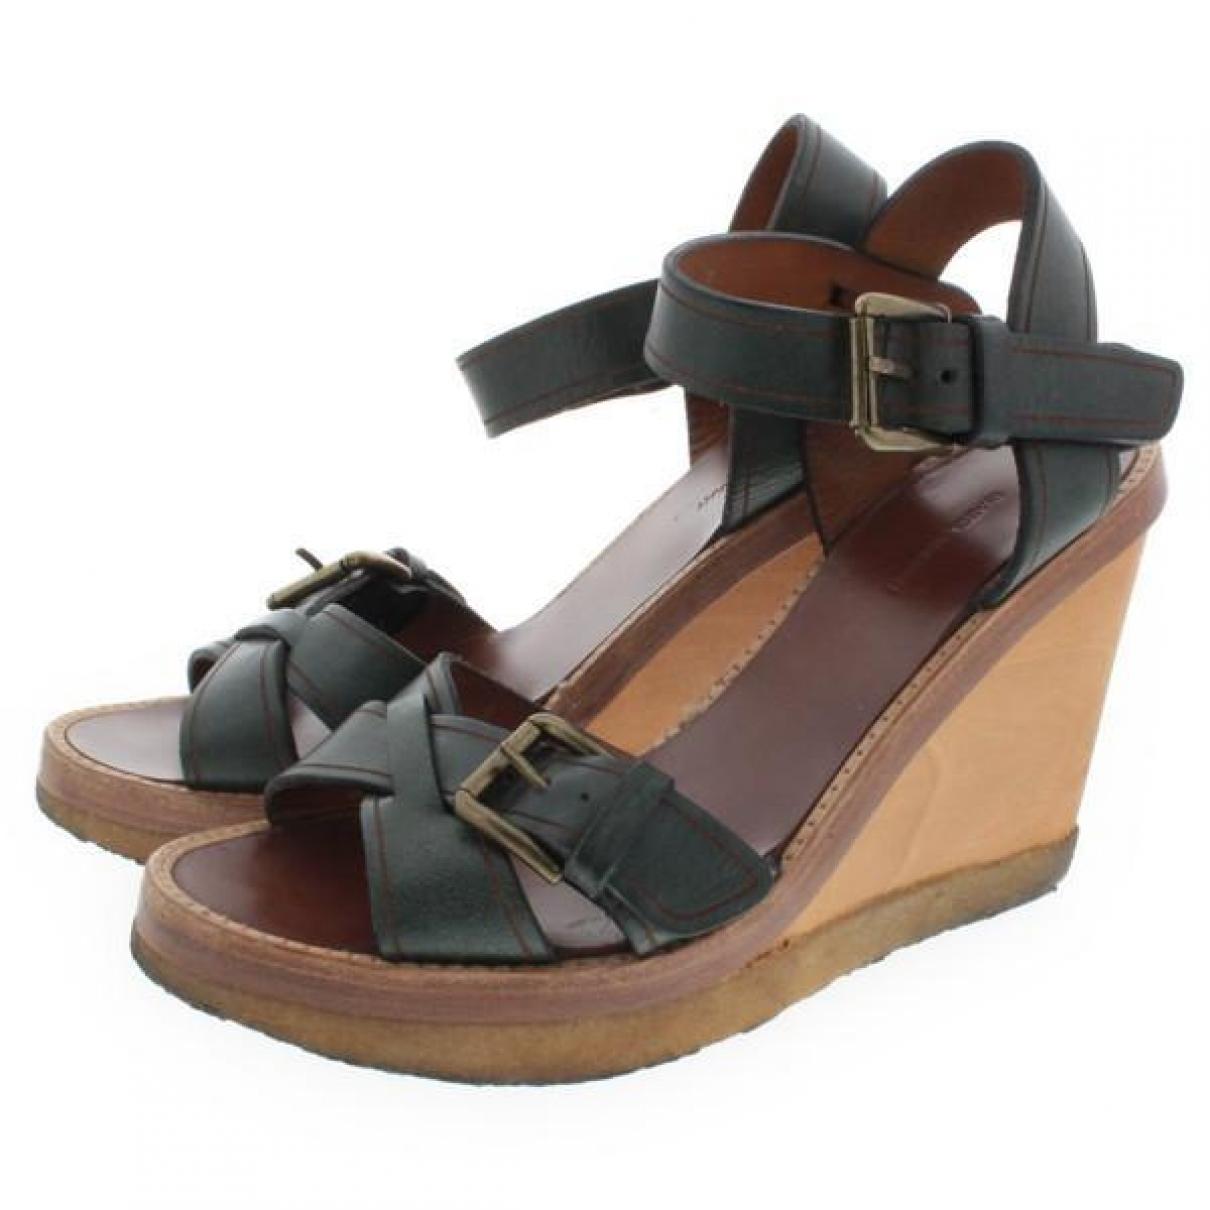 Isabel Marant \N Green Leather Sandals for Women 38 EU